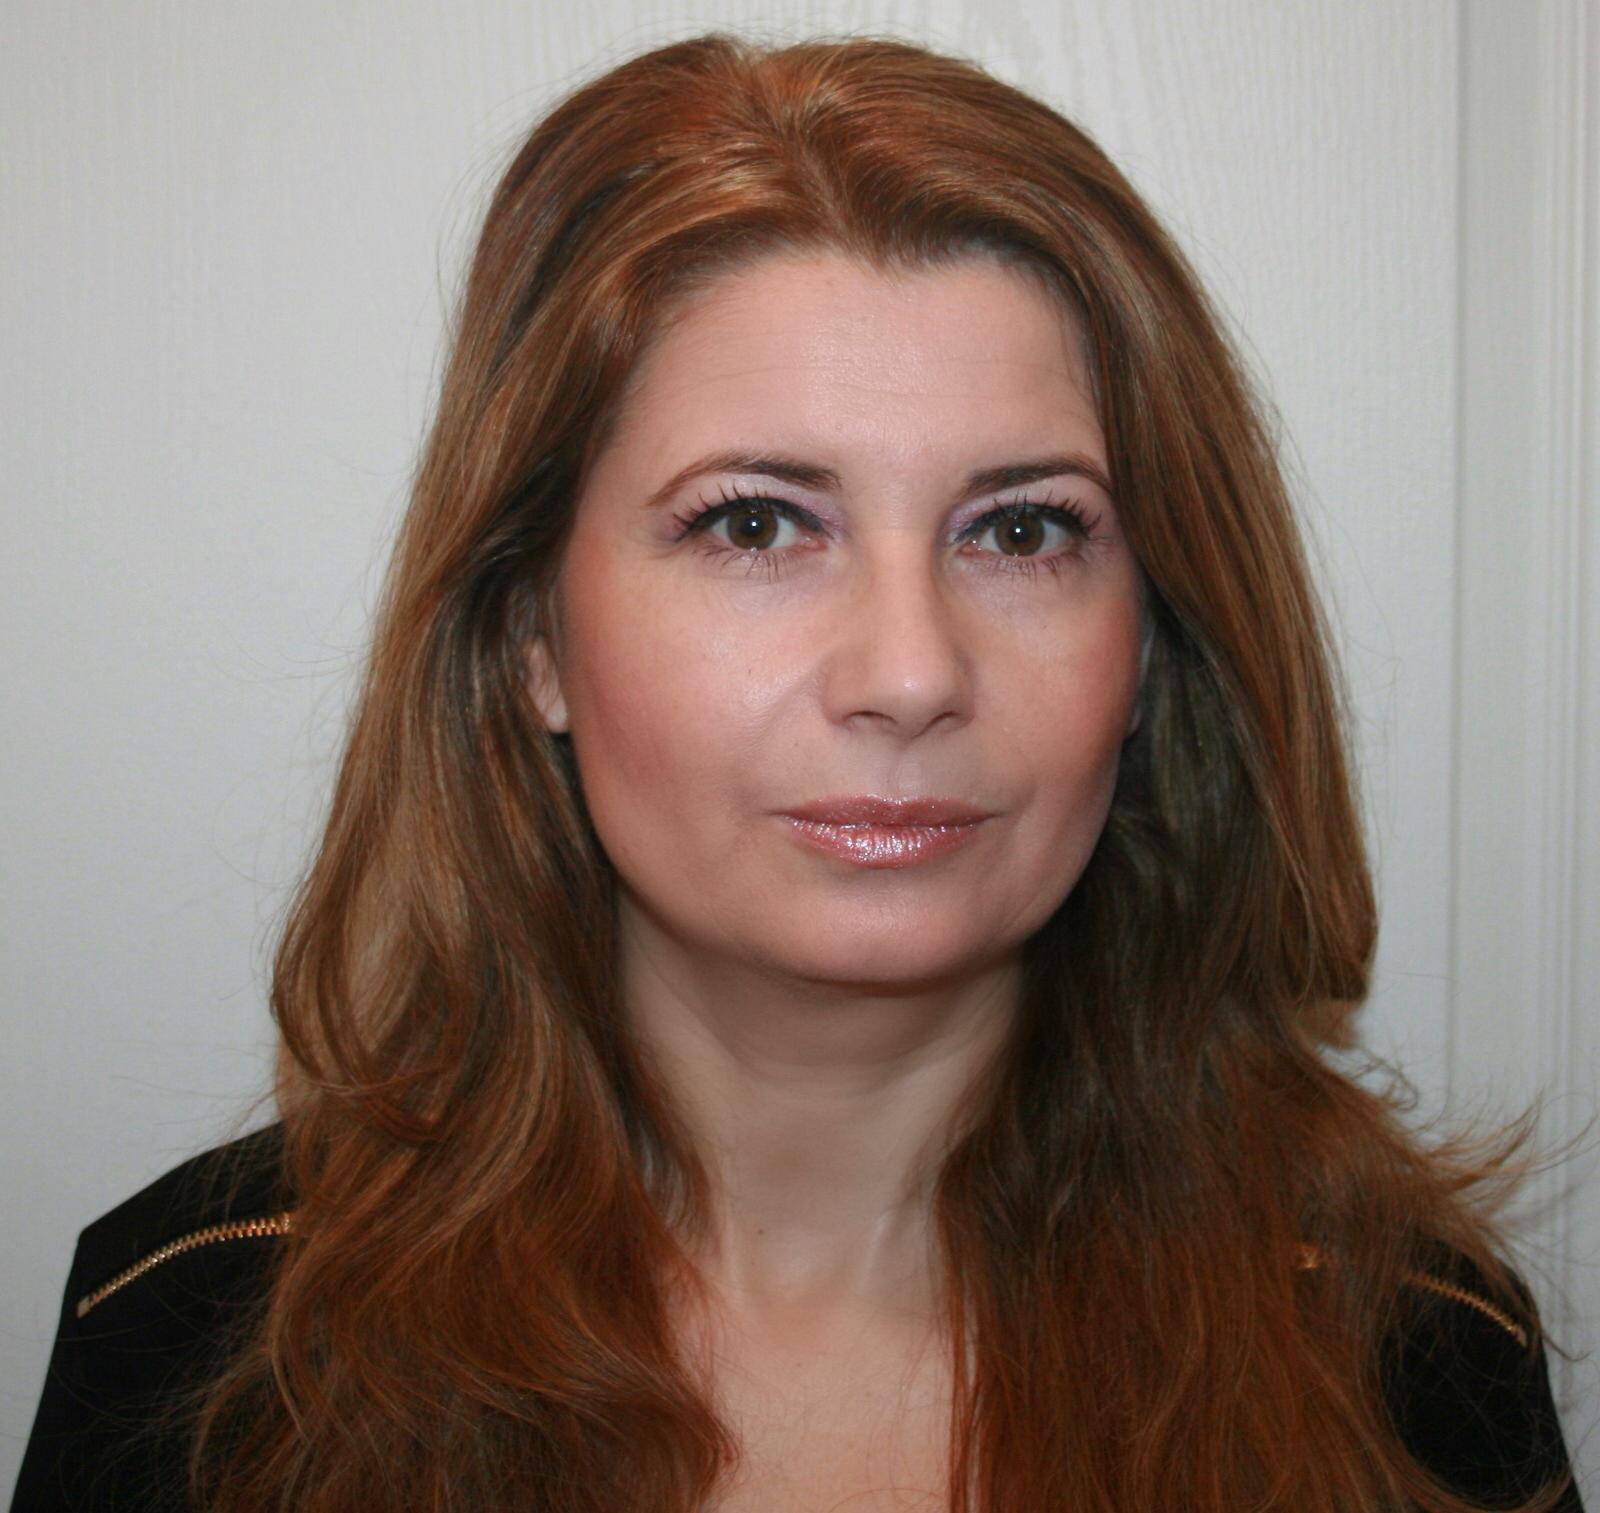 Marilena Mantu